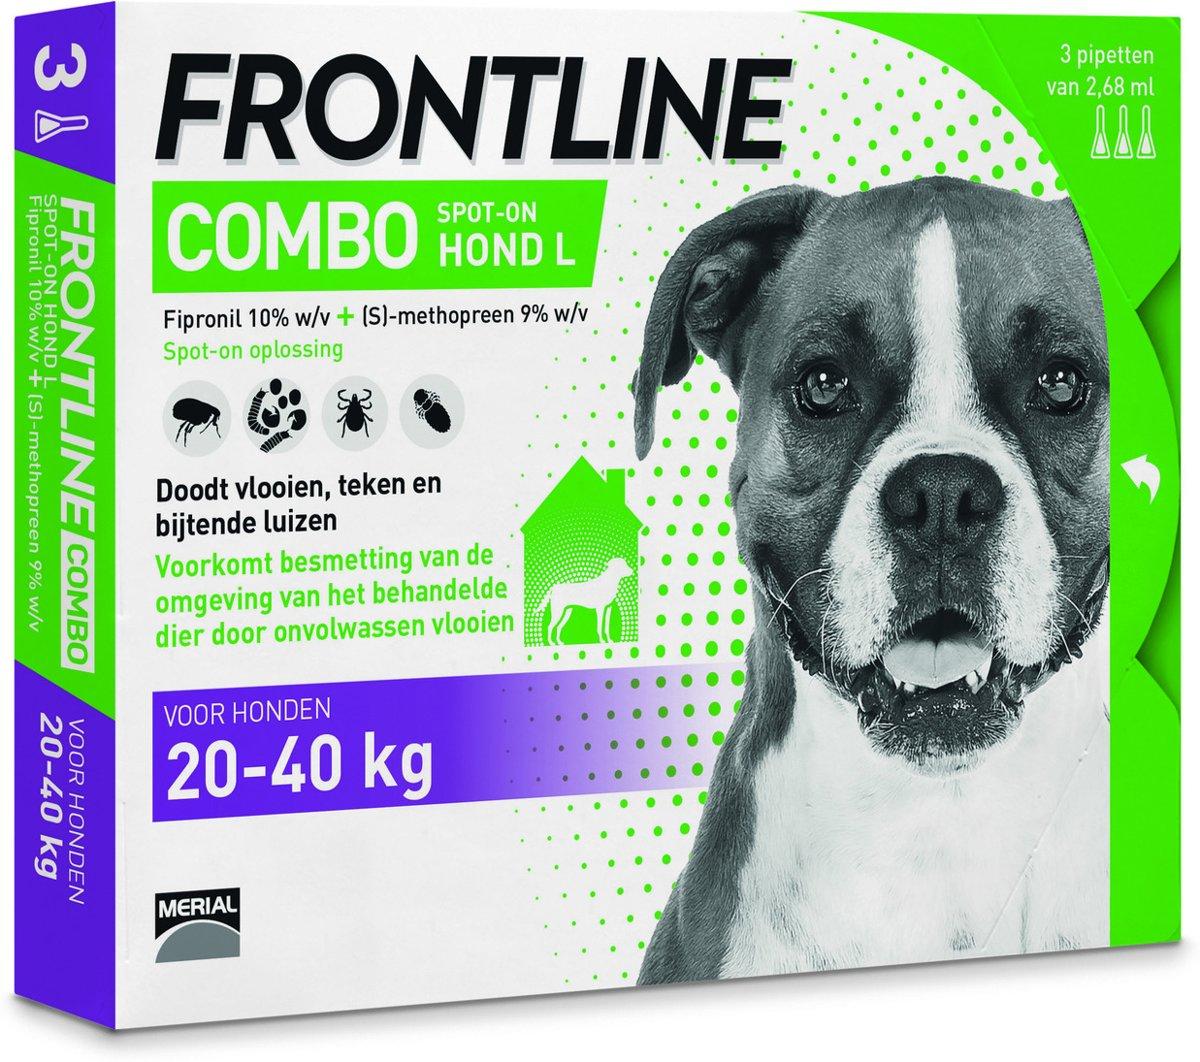 Frontline Combo - L: van 20 tot 40 kg - Anti vlooienmiddel en tekenmiddel - Hond - 3 pipetten